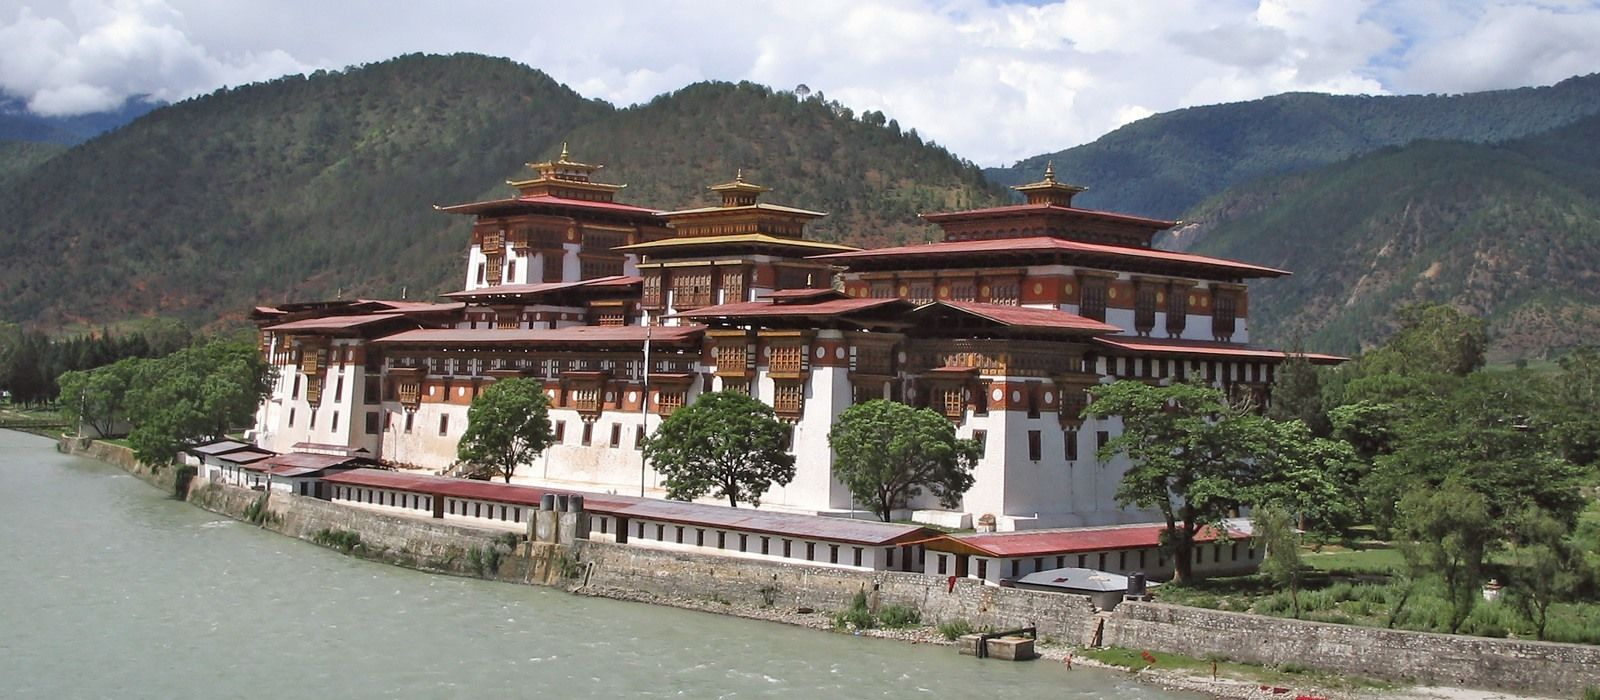 Nepalreise: Paläste, Tiger und Himalaya Urlaub 4